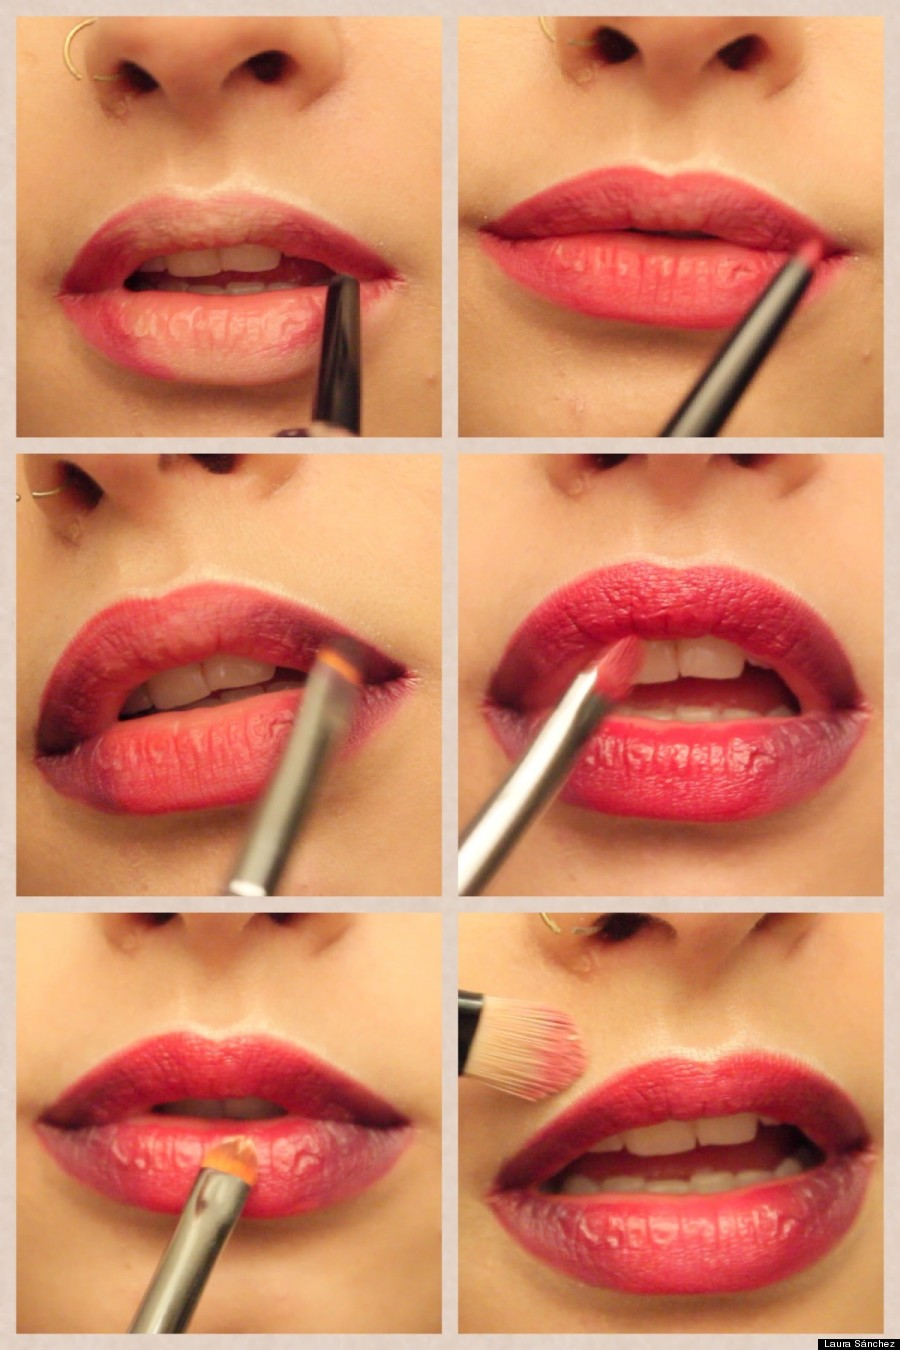 Degrad en los labios paso a paso en fotos huffpost for Labios mate paso a paso